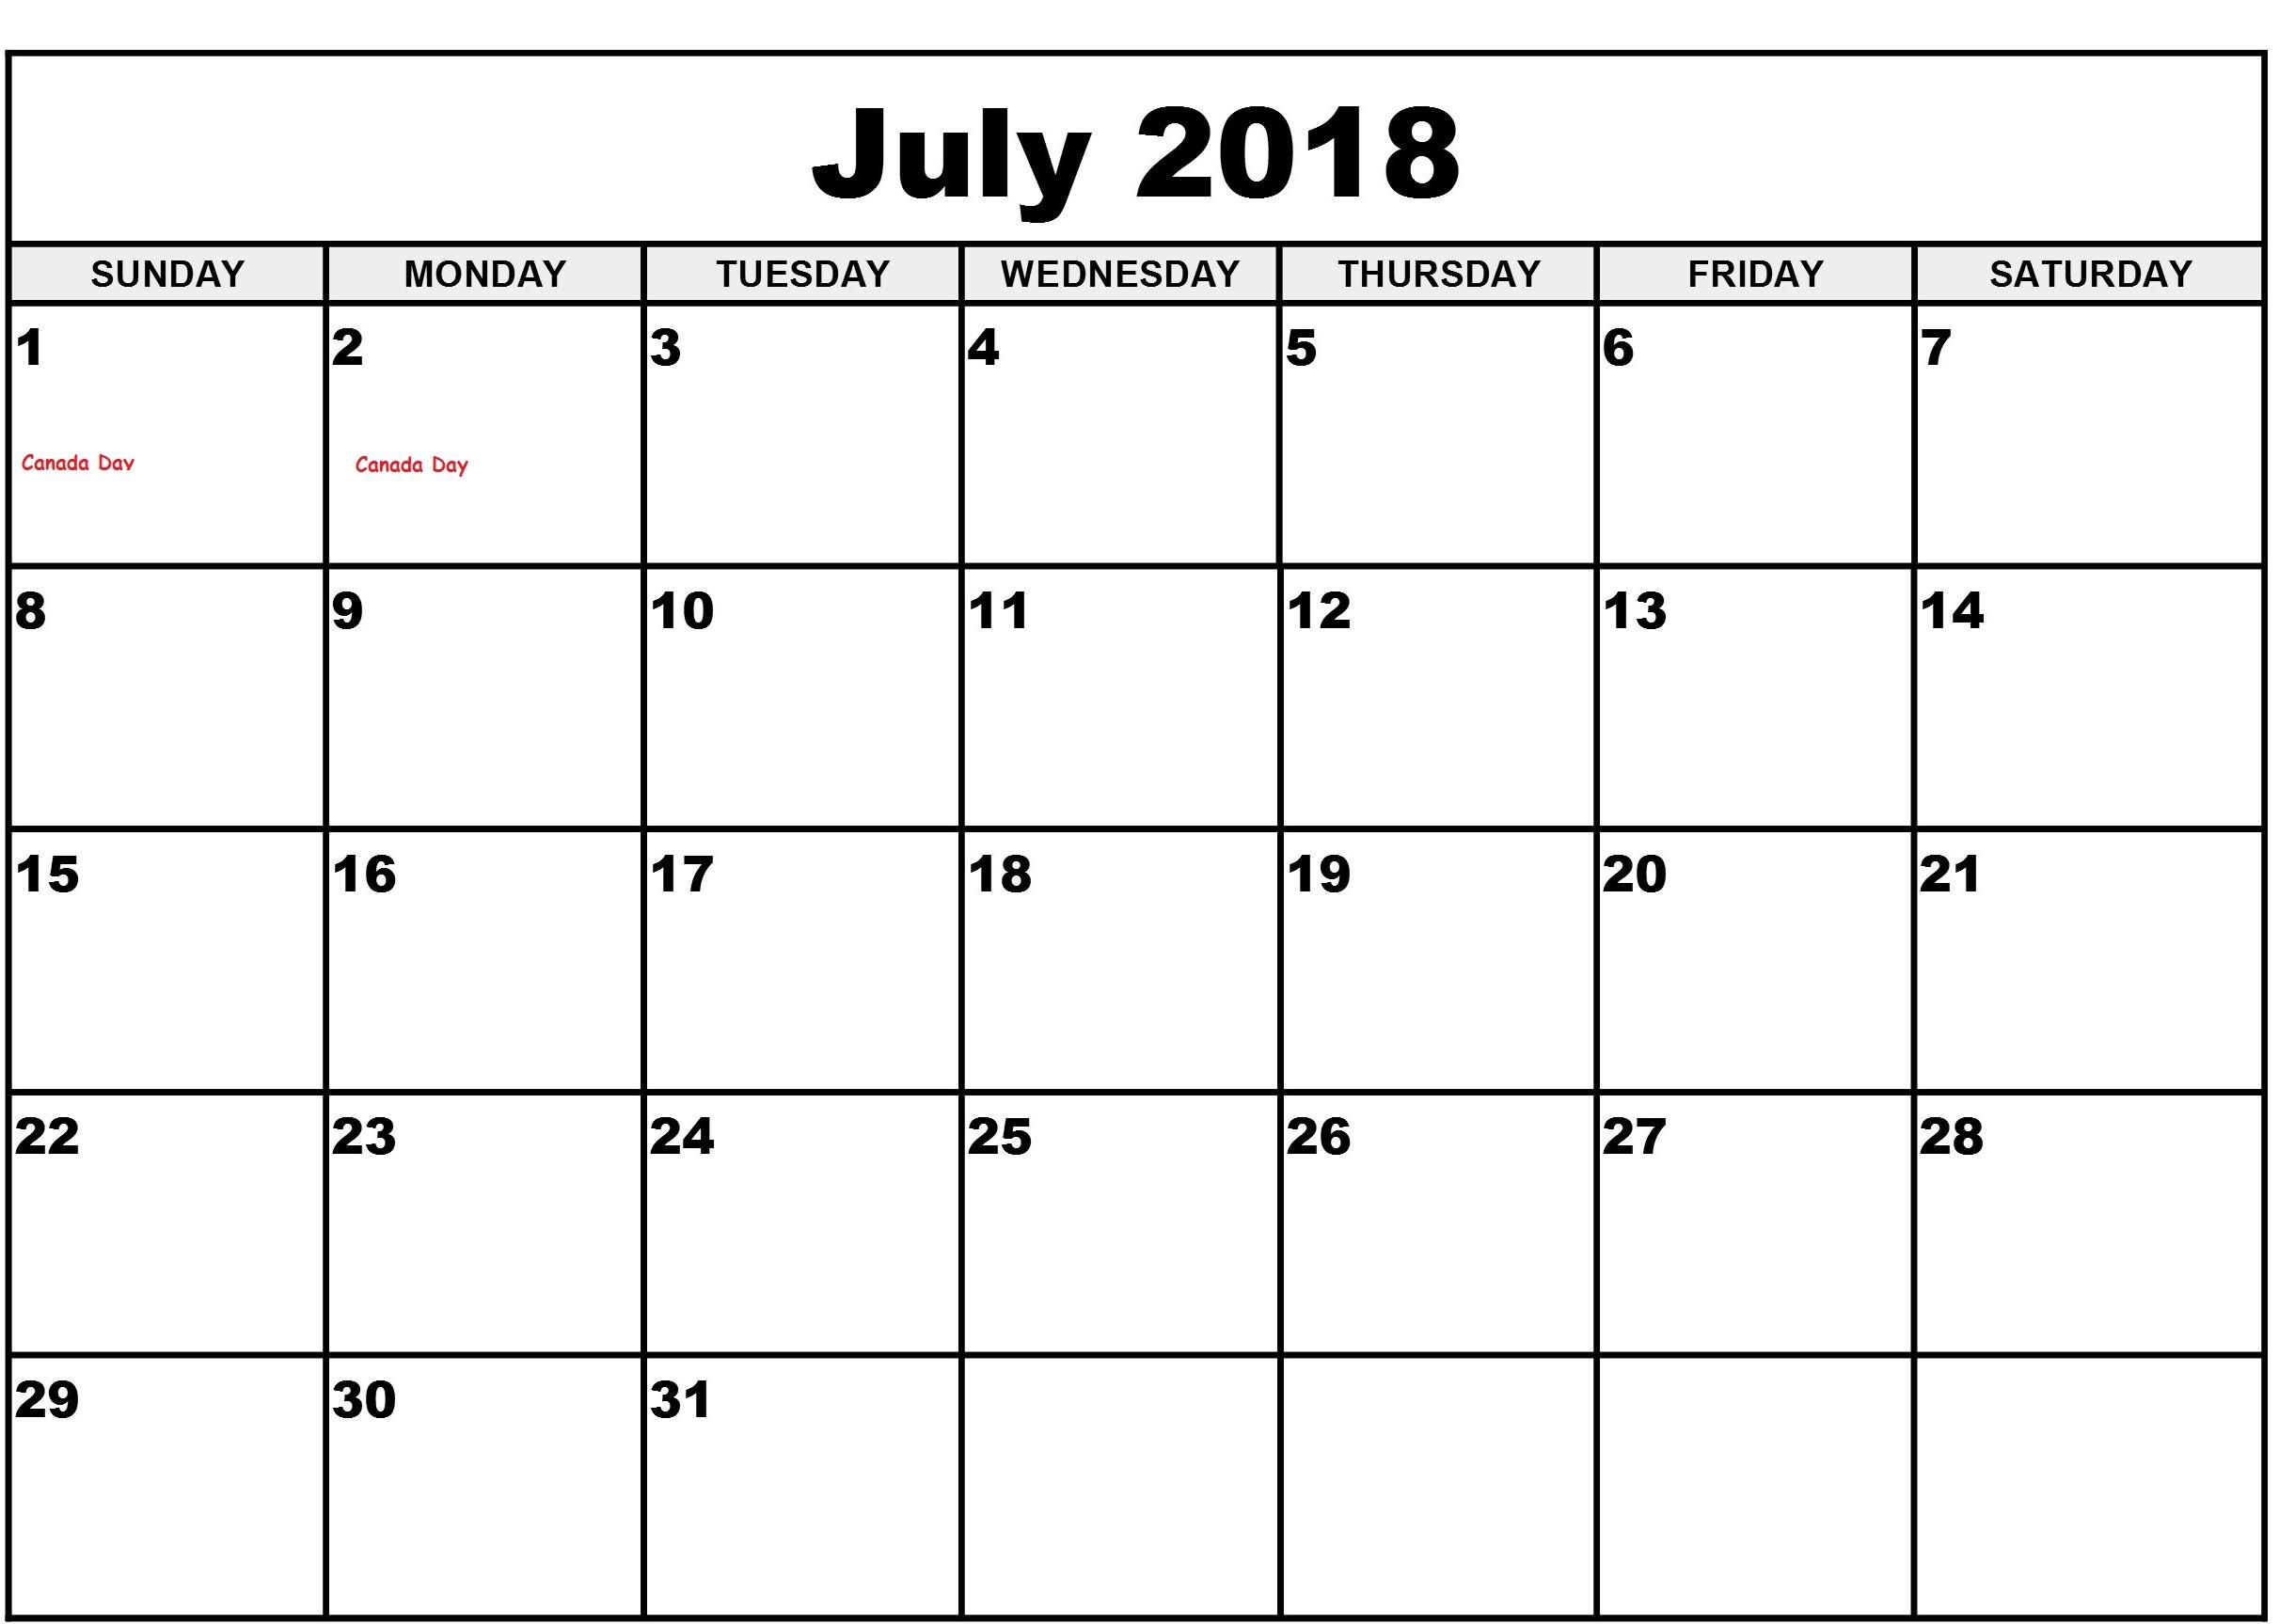 July-2018-Calendar-Template-Site-Provider.jpg